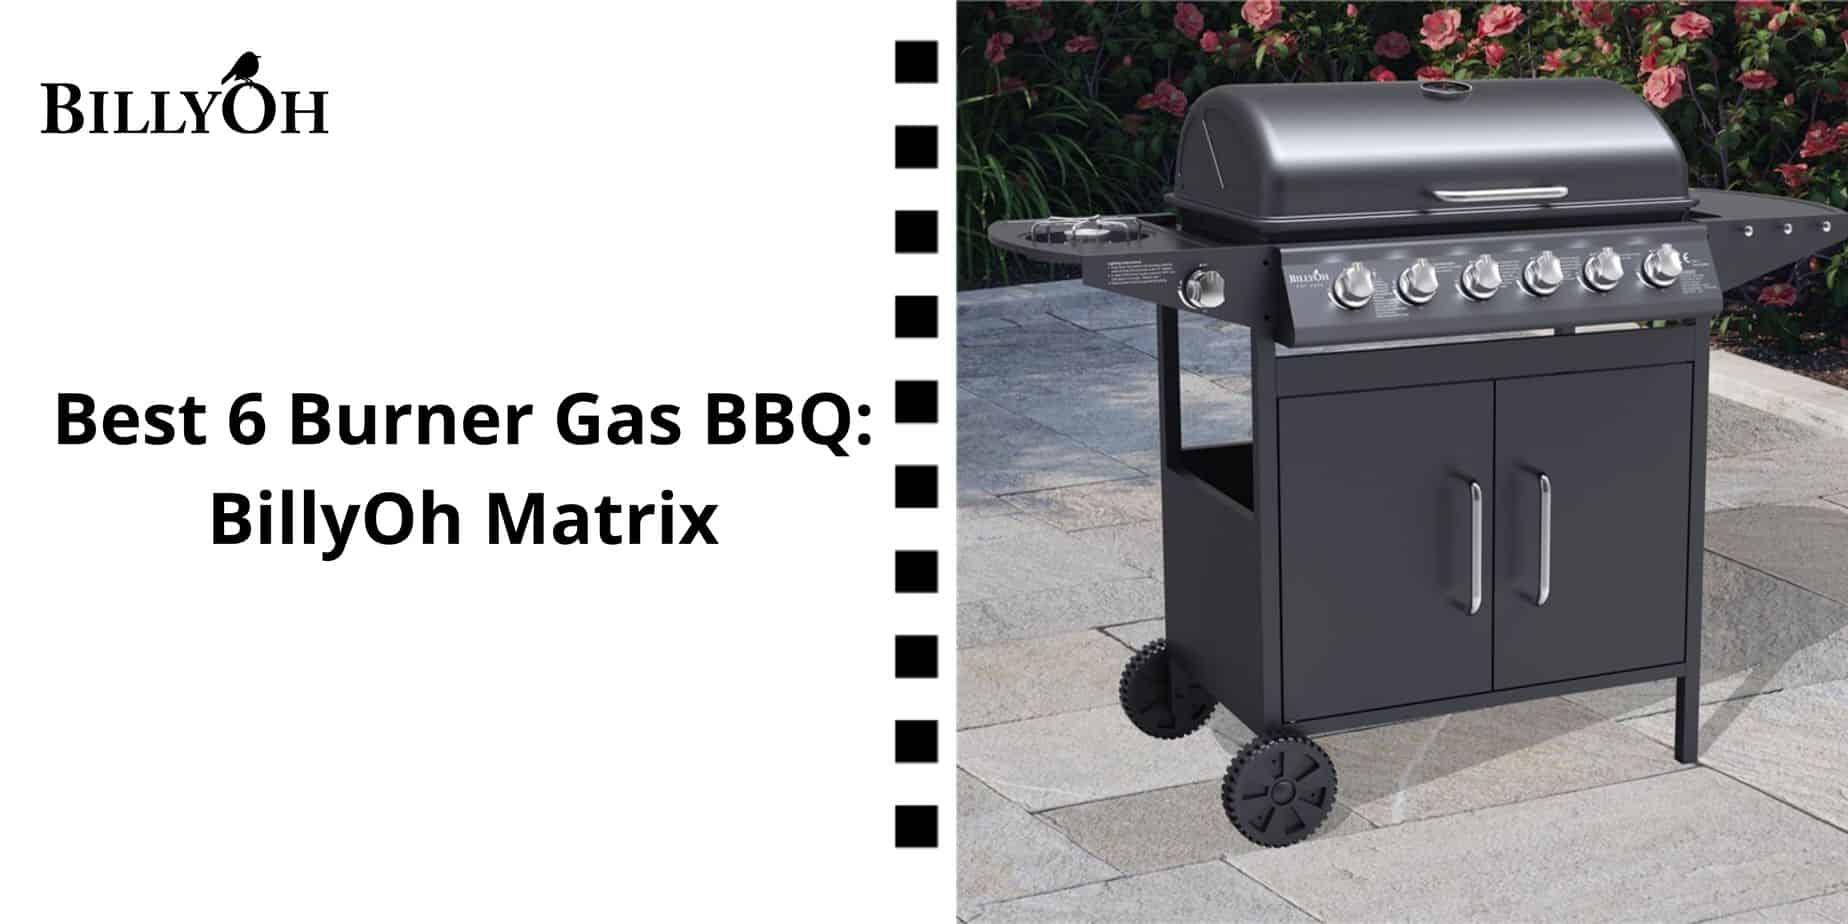 BillyOh Best 6 Burner BBQ Matrix